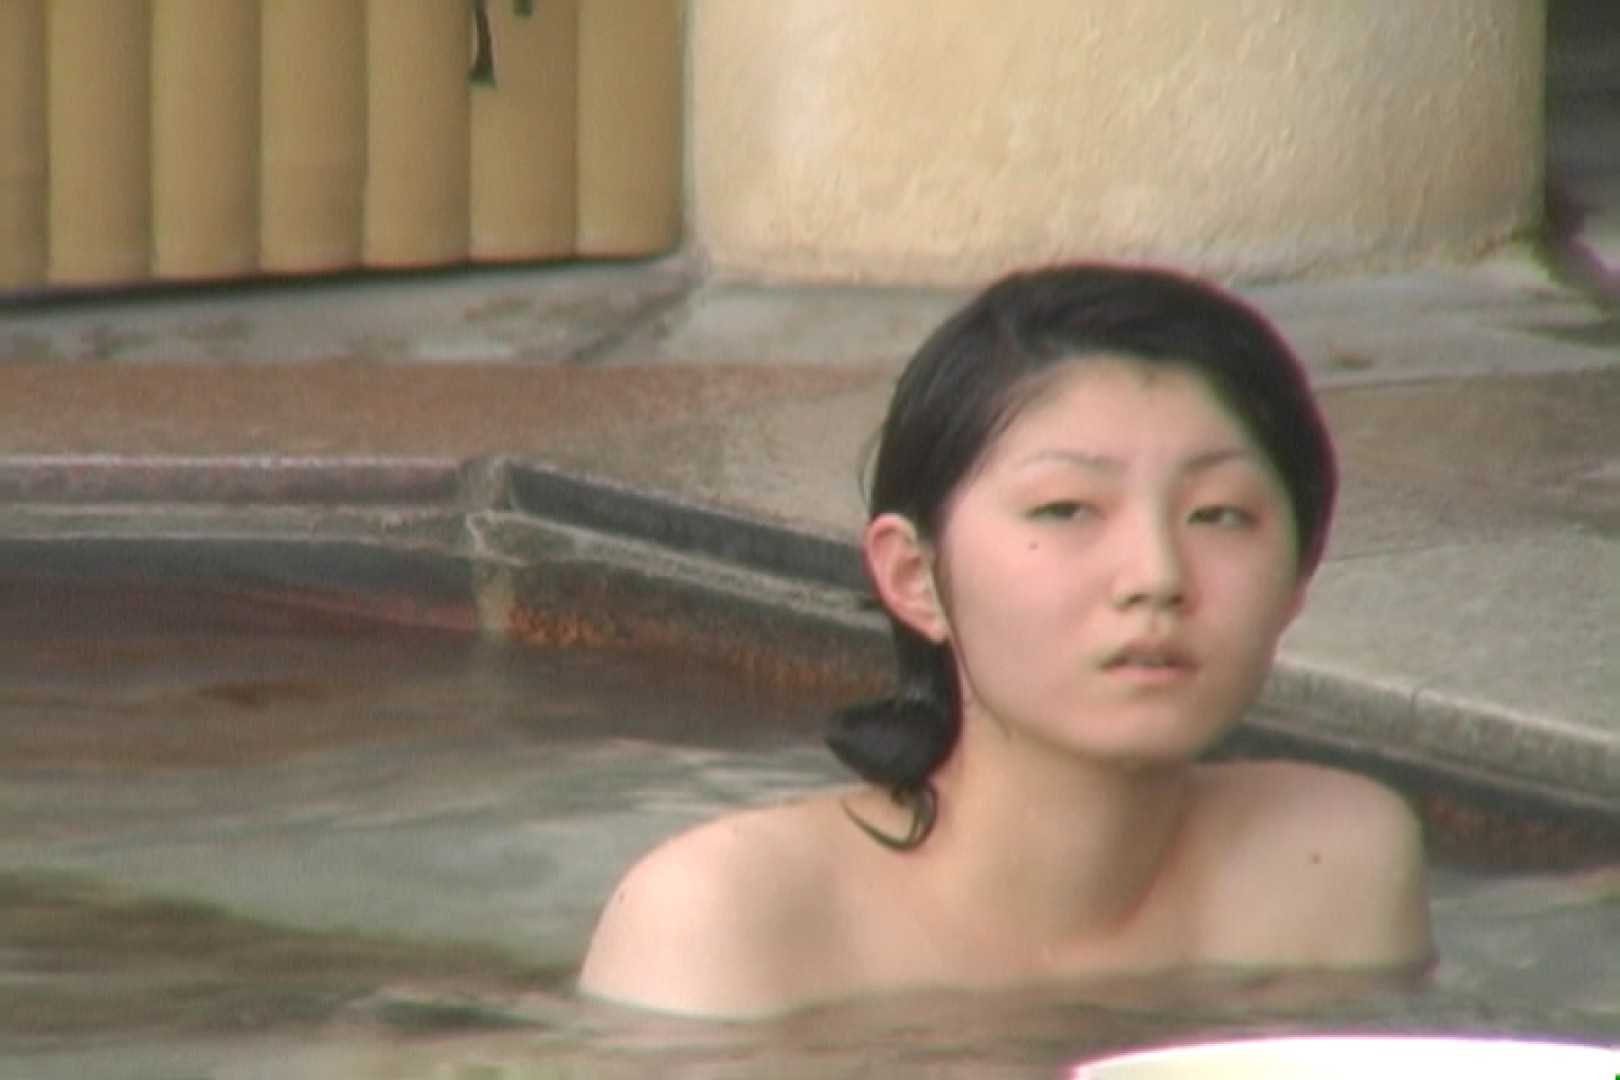 Aquaな露天風呂Vol.579 OL女体 | 露天  72連発 28